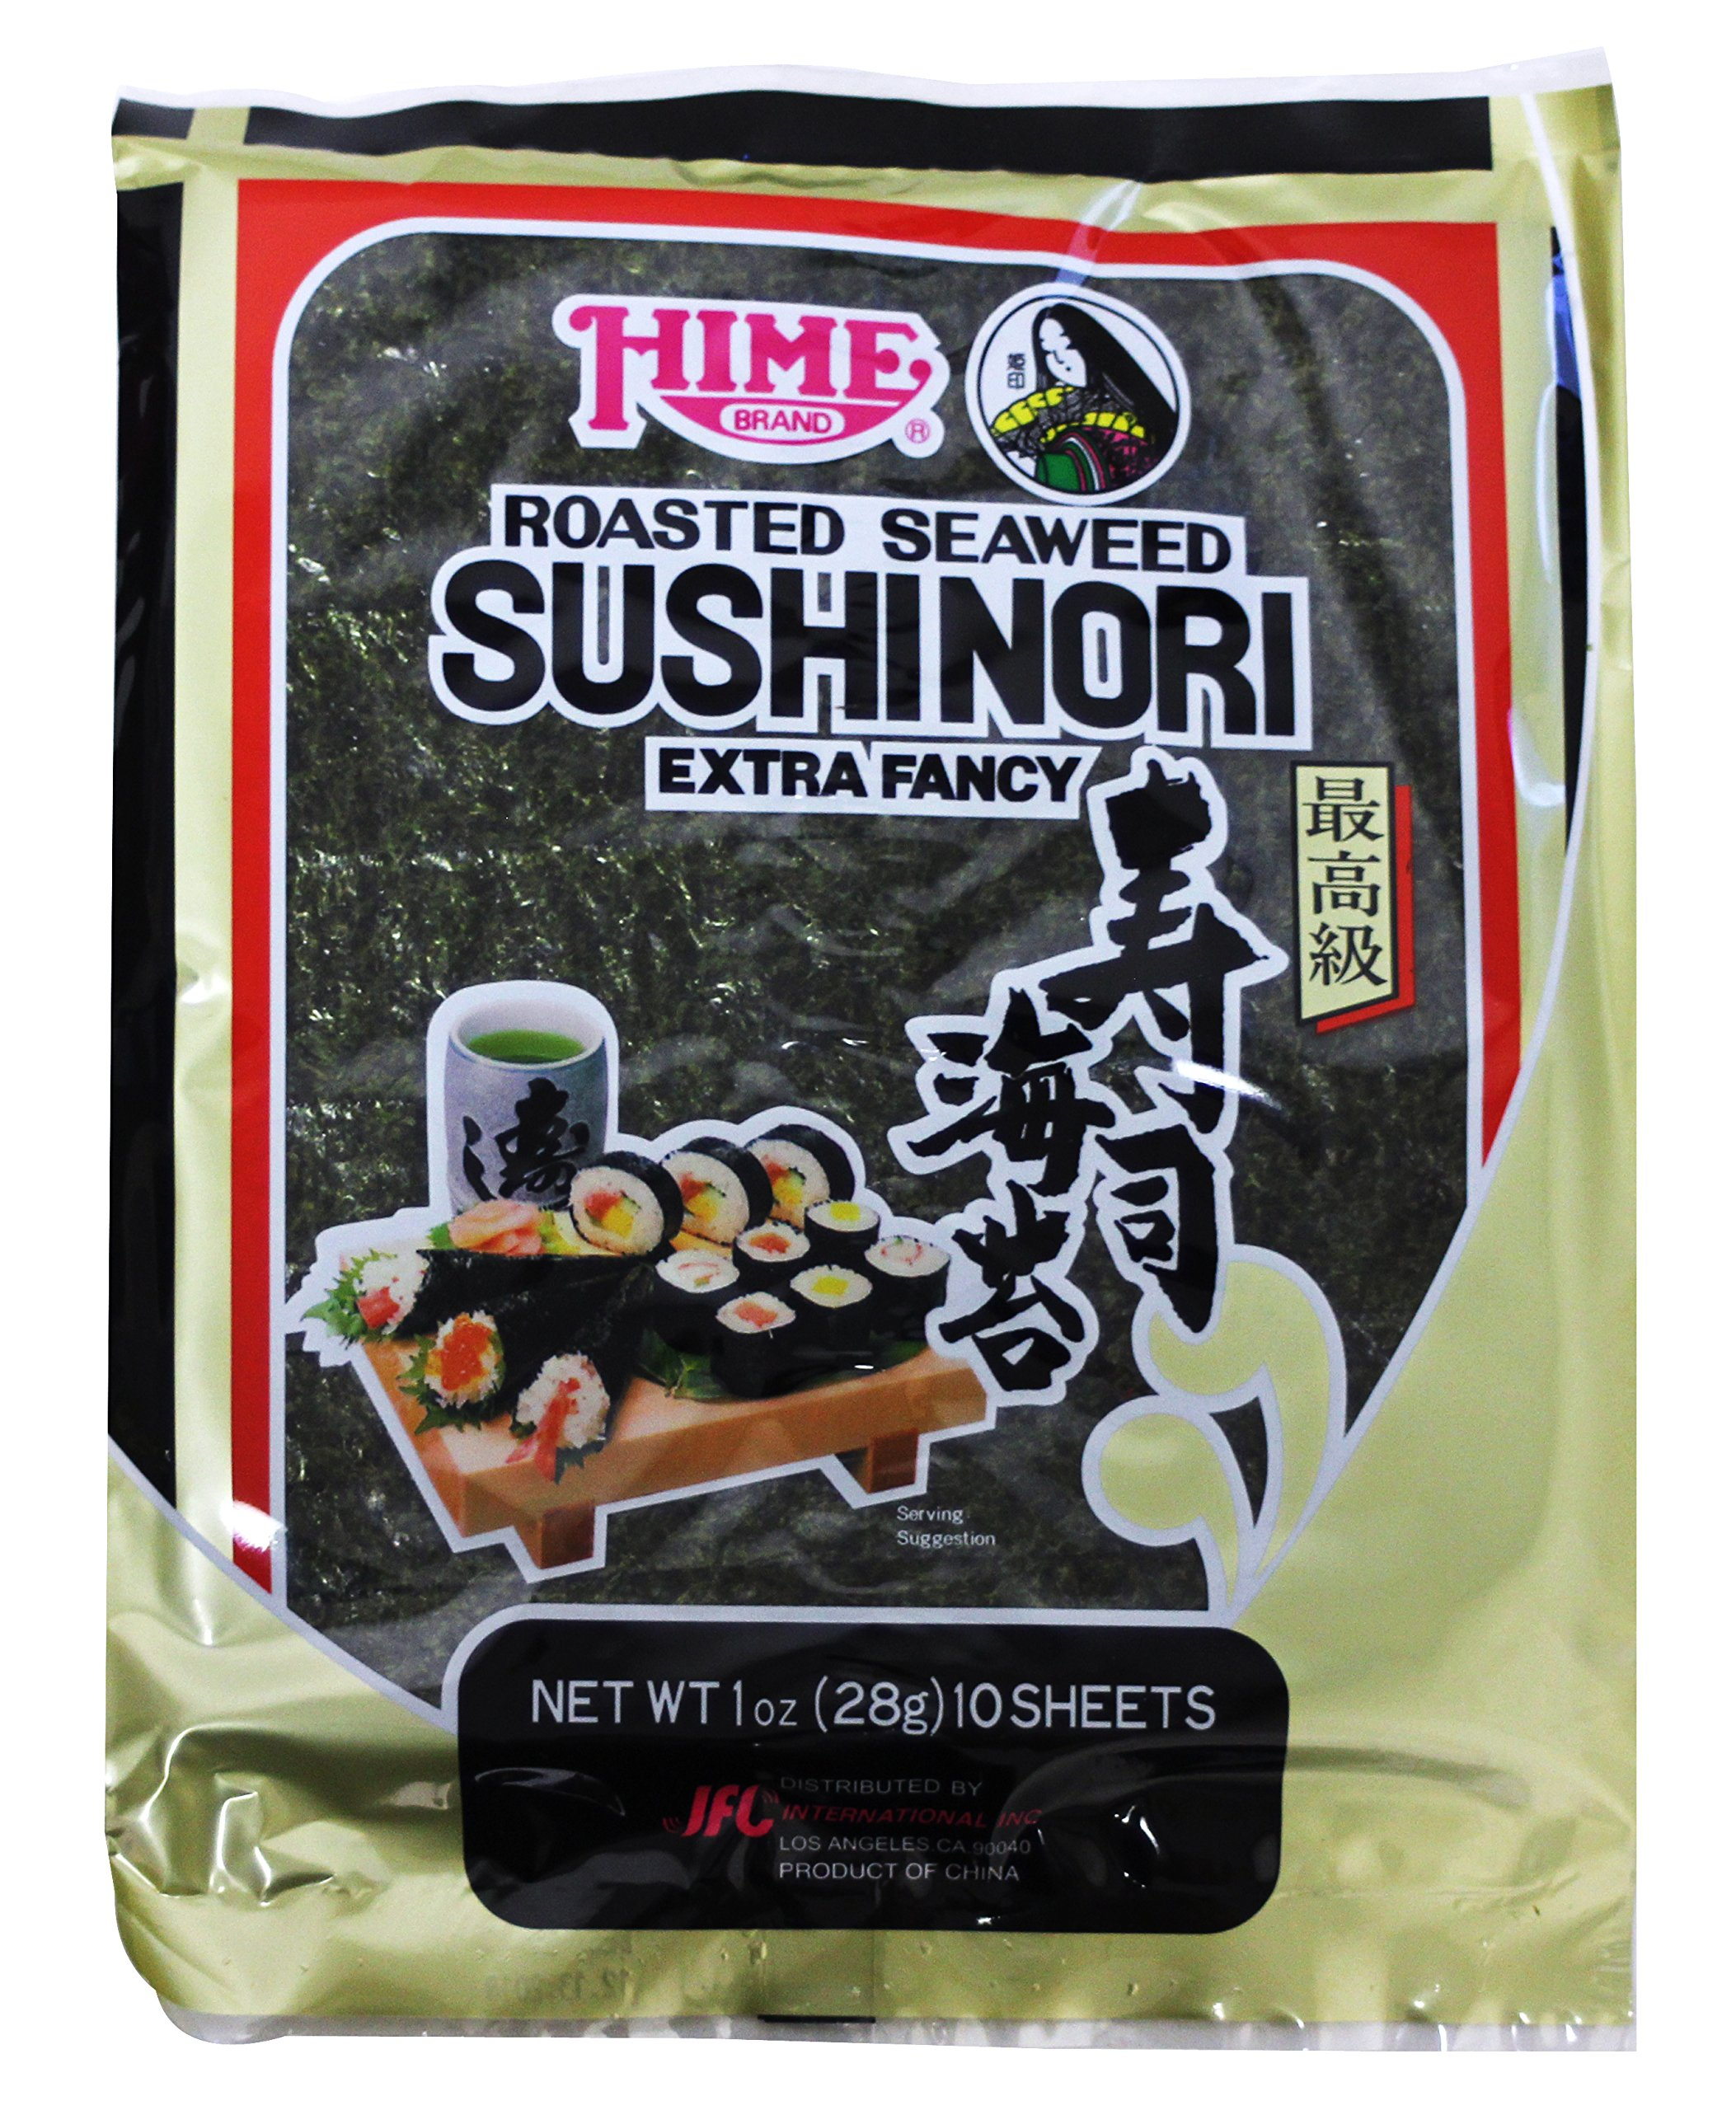 Hime Tempura Batter Roasted Seaweed Sushinori Wrap, 1 Ounce - 10 per pack - 12 packs per case.